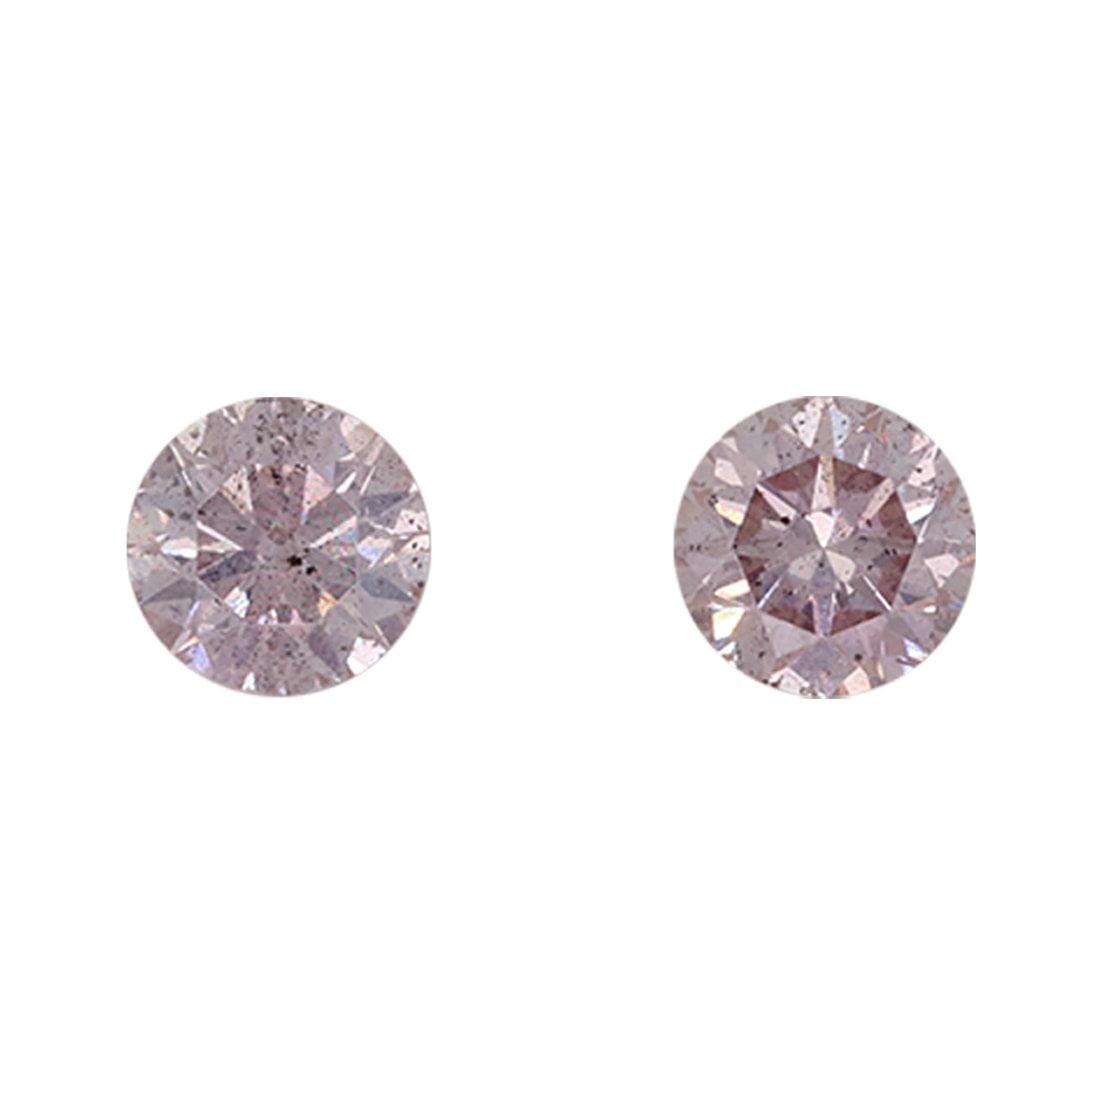 2=0.38ct Natural Fancy Light Pink, 8P, I1, Argyle Pink Diamond